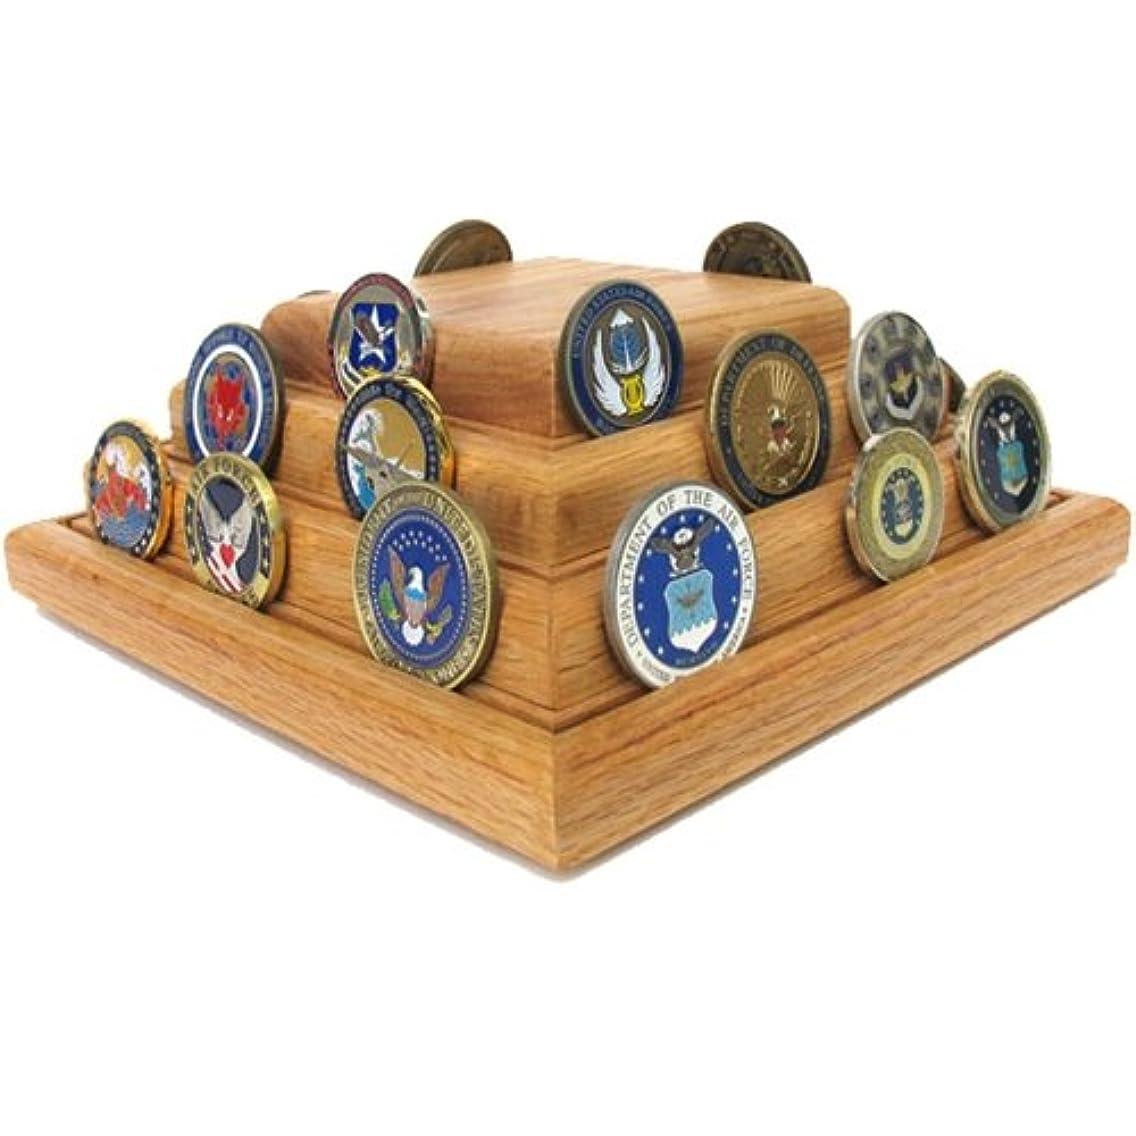 Wooden Pyramid Coin Display